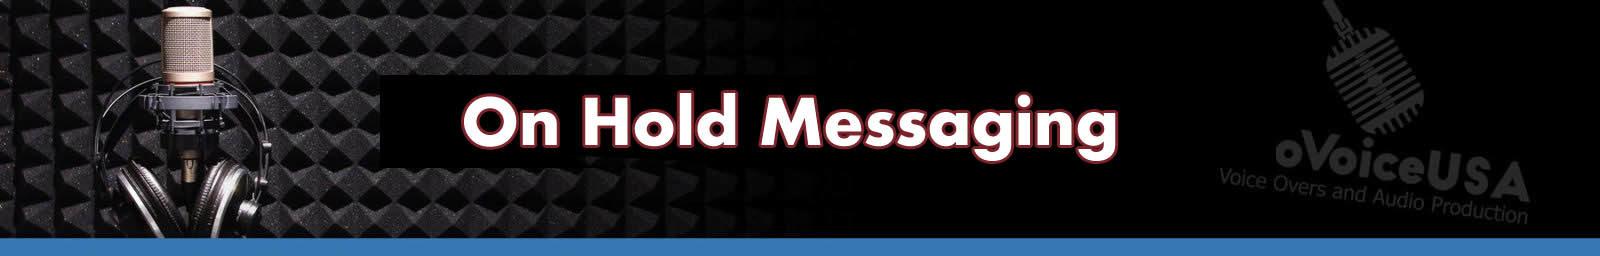 On Hold Messaging header